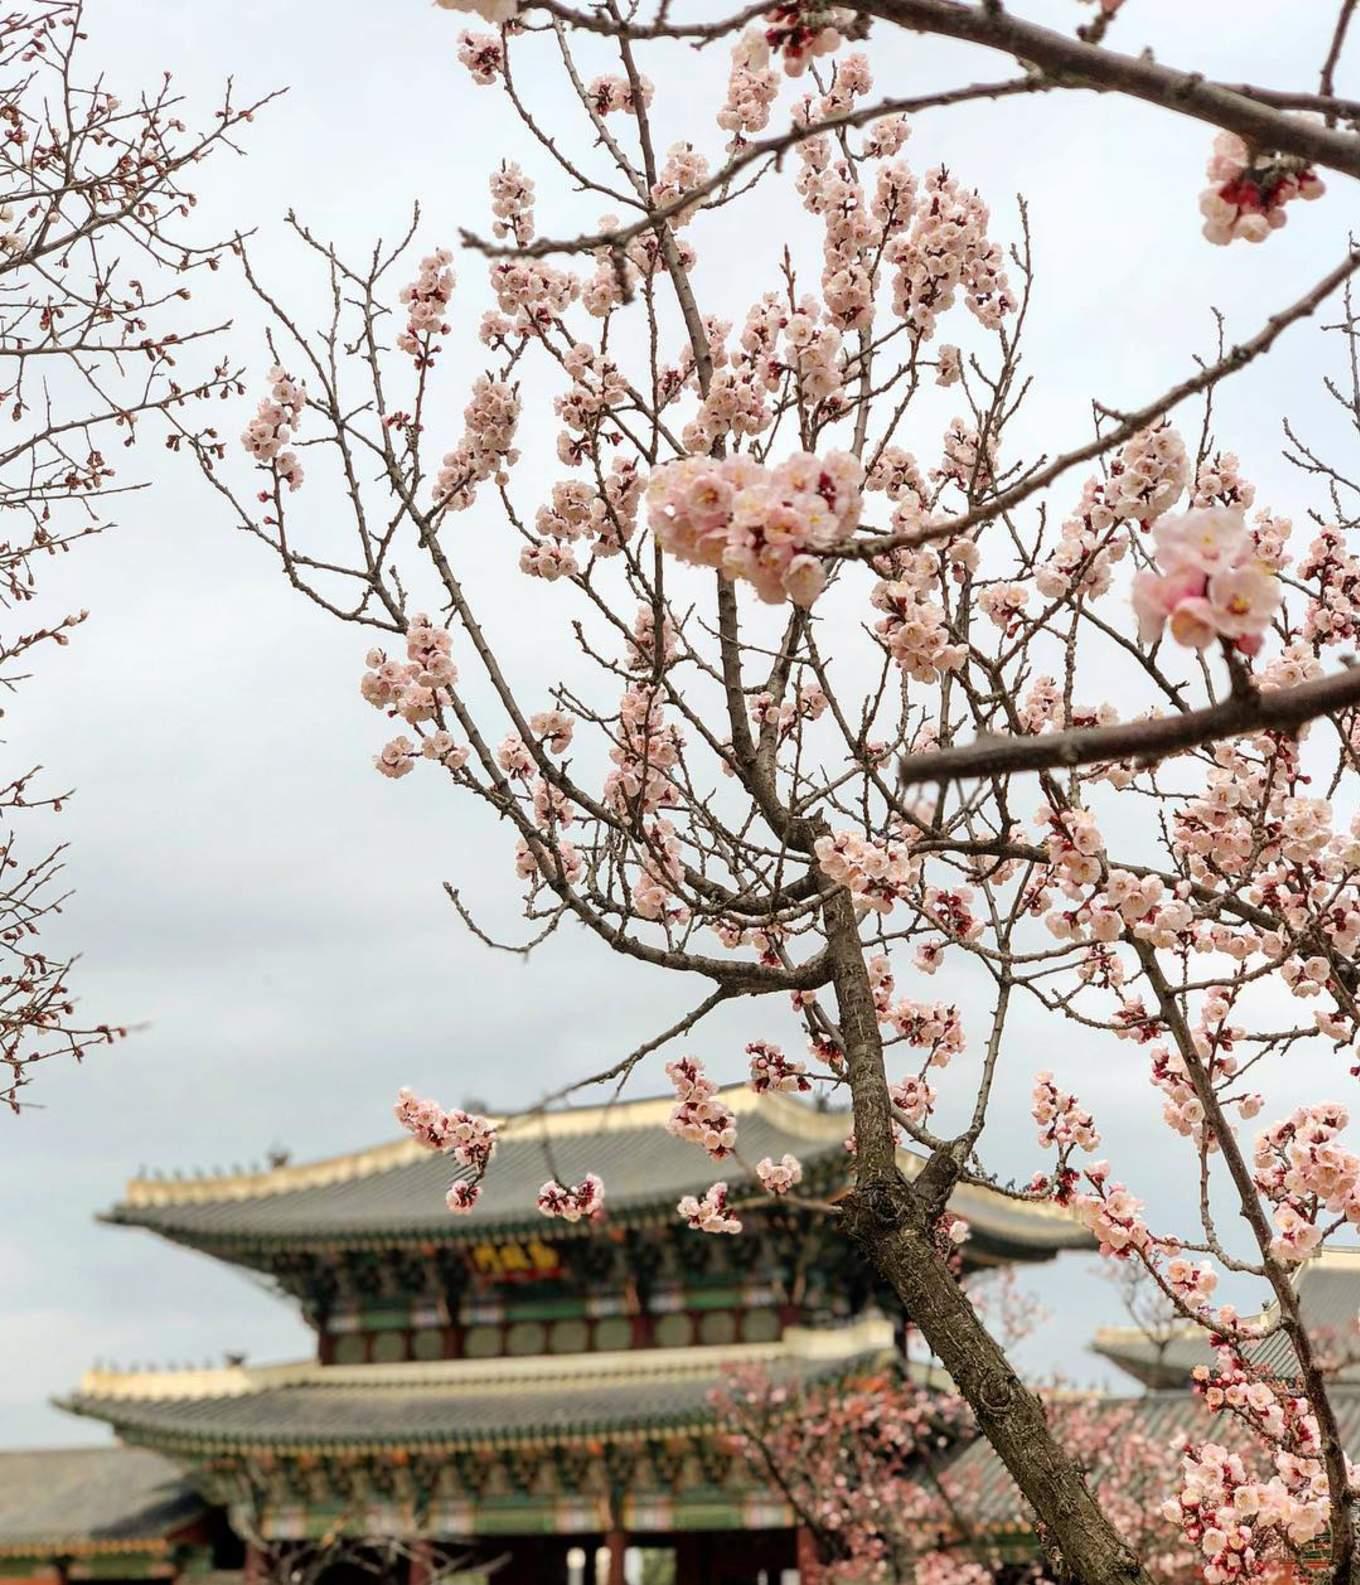 Gyeongbokgung Palace cherry blossoms